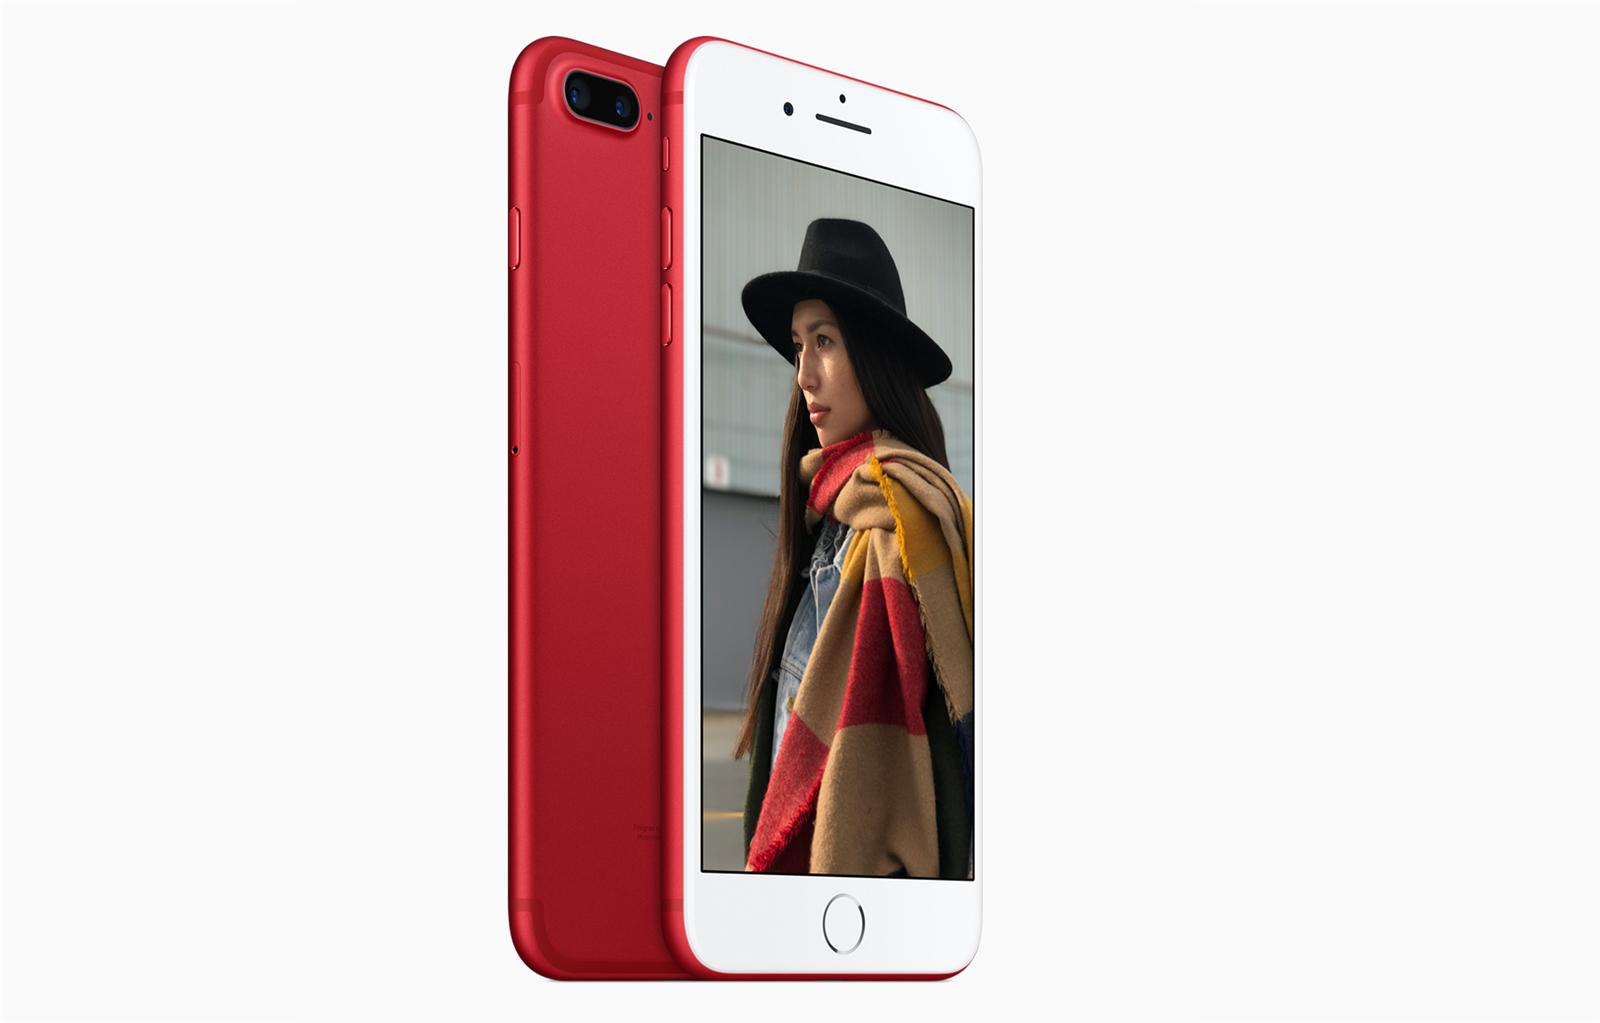 iPhone-7-plus-rojo-color